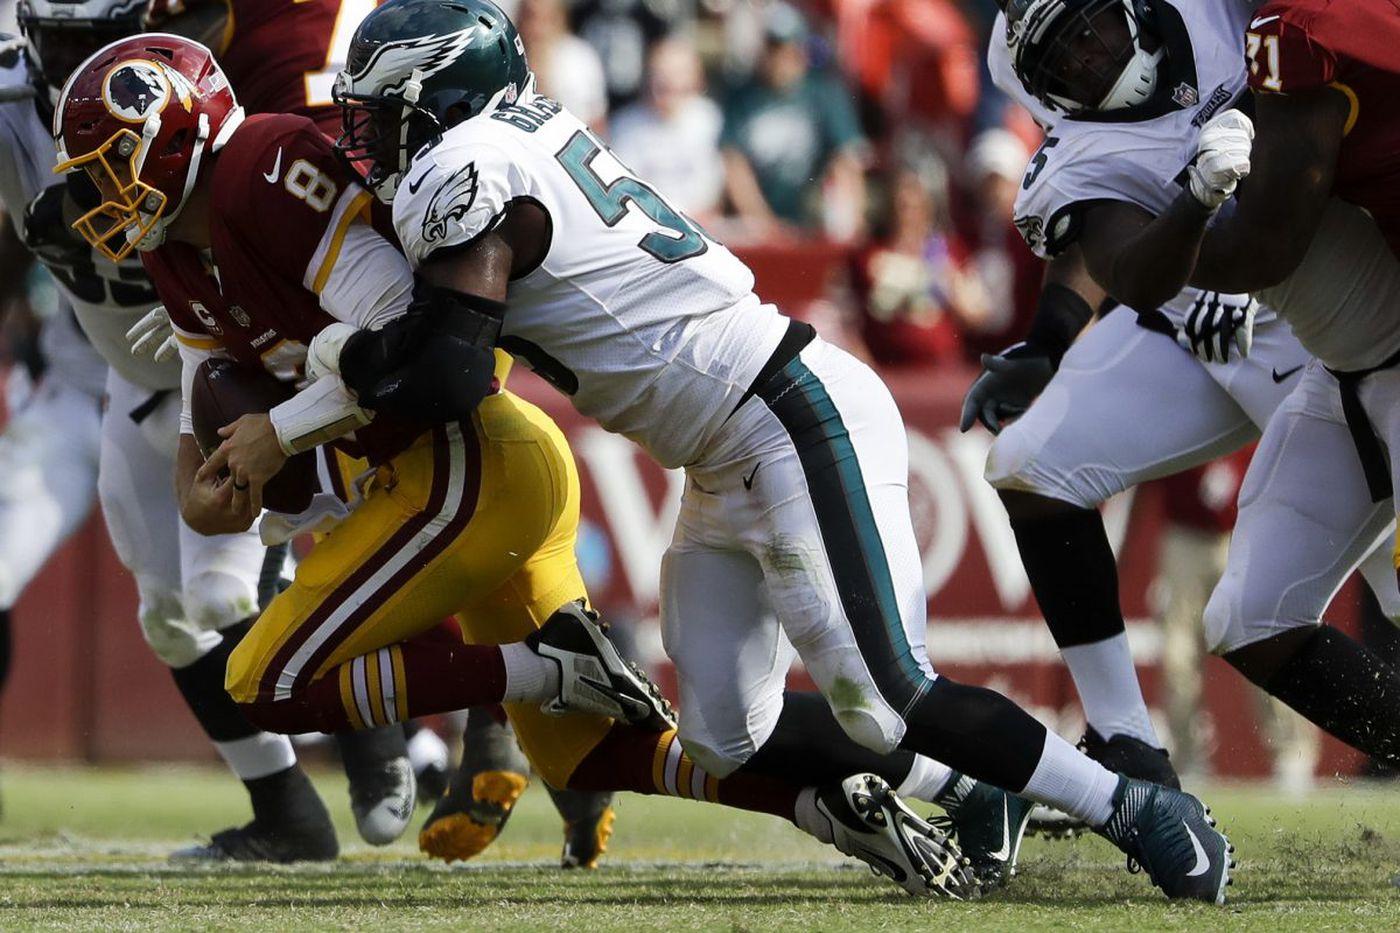 Pressure is nice, but Brandon Graham wants sacks